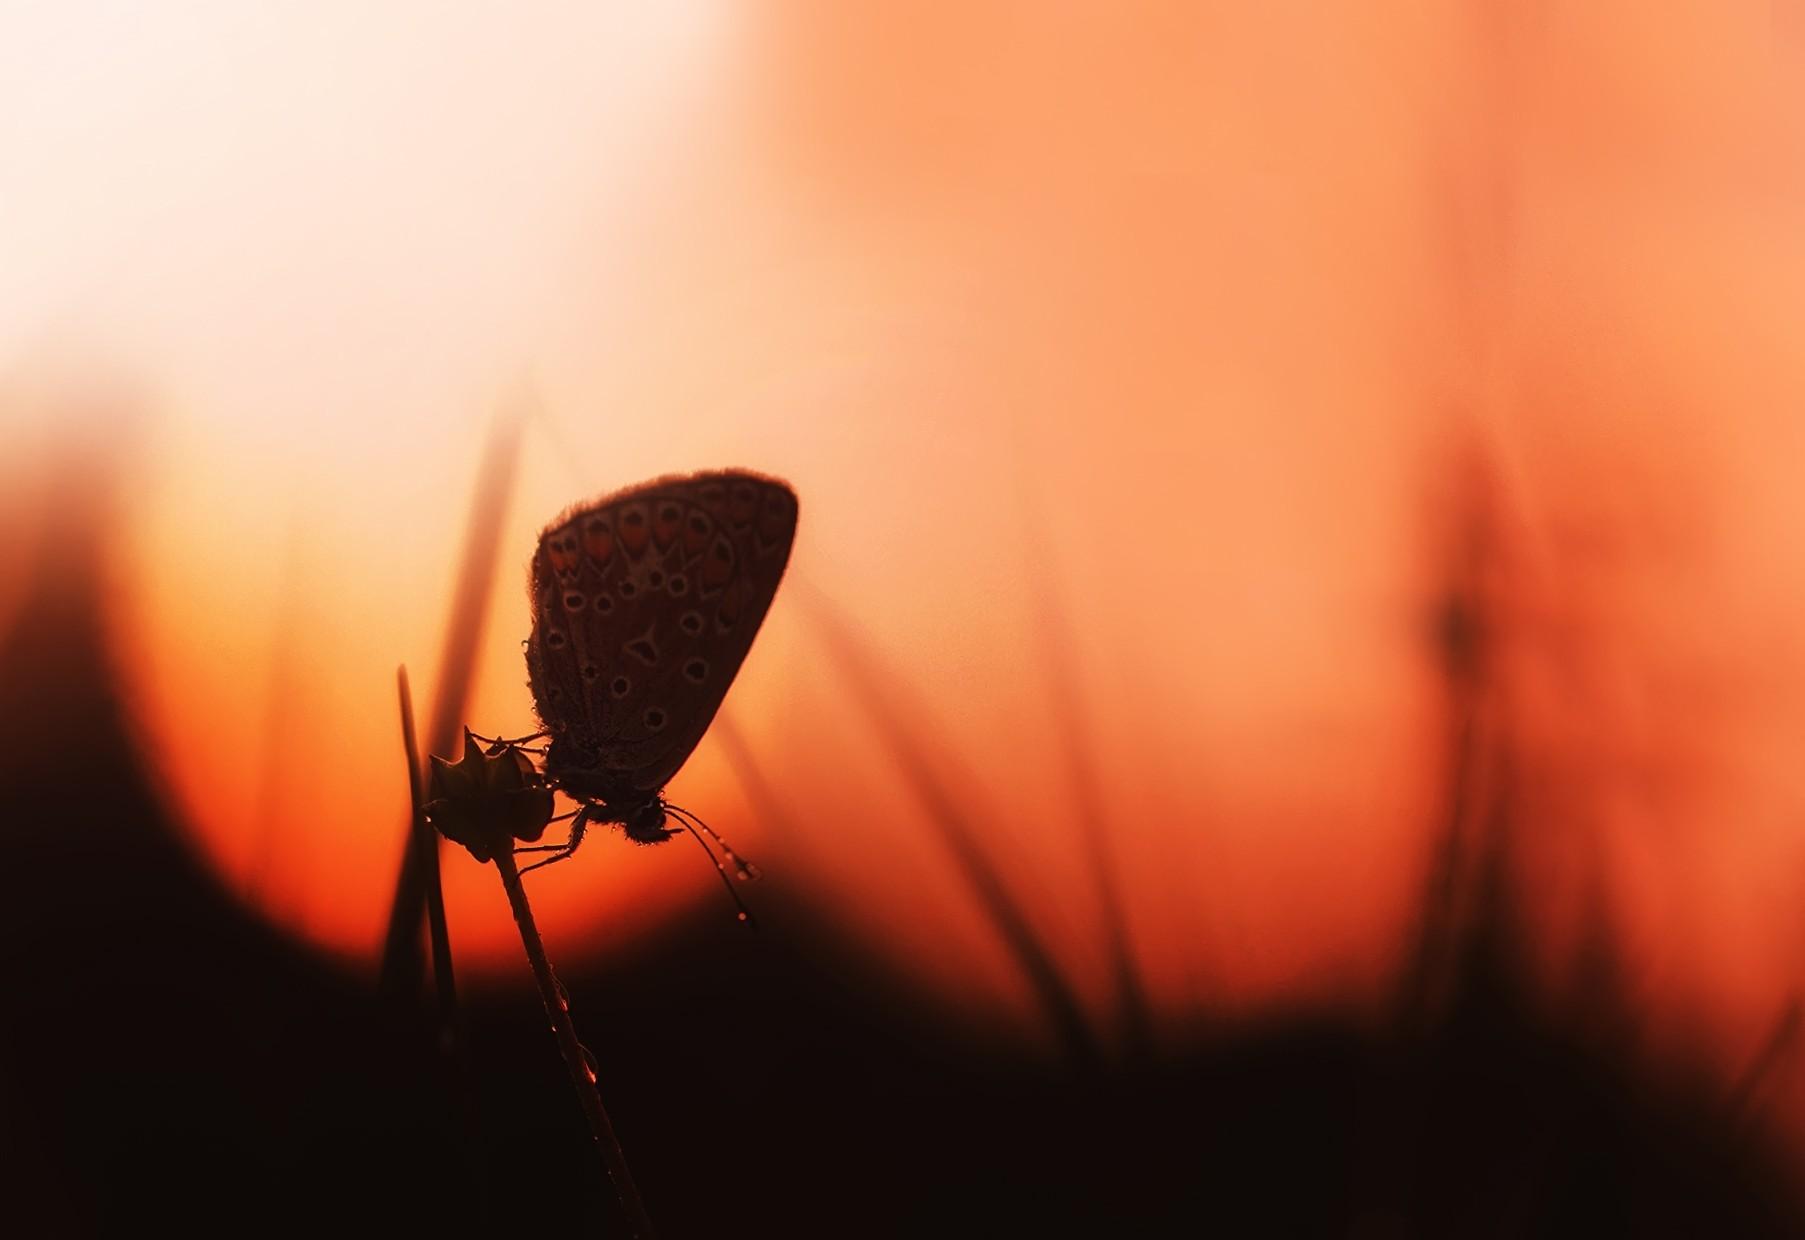 Photo in Backlight | Author Hristina Russeva - XristinaRuseva | PHOTO FORUM